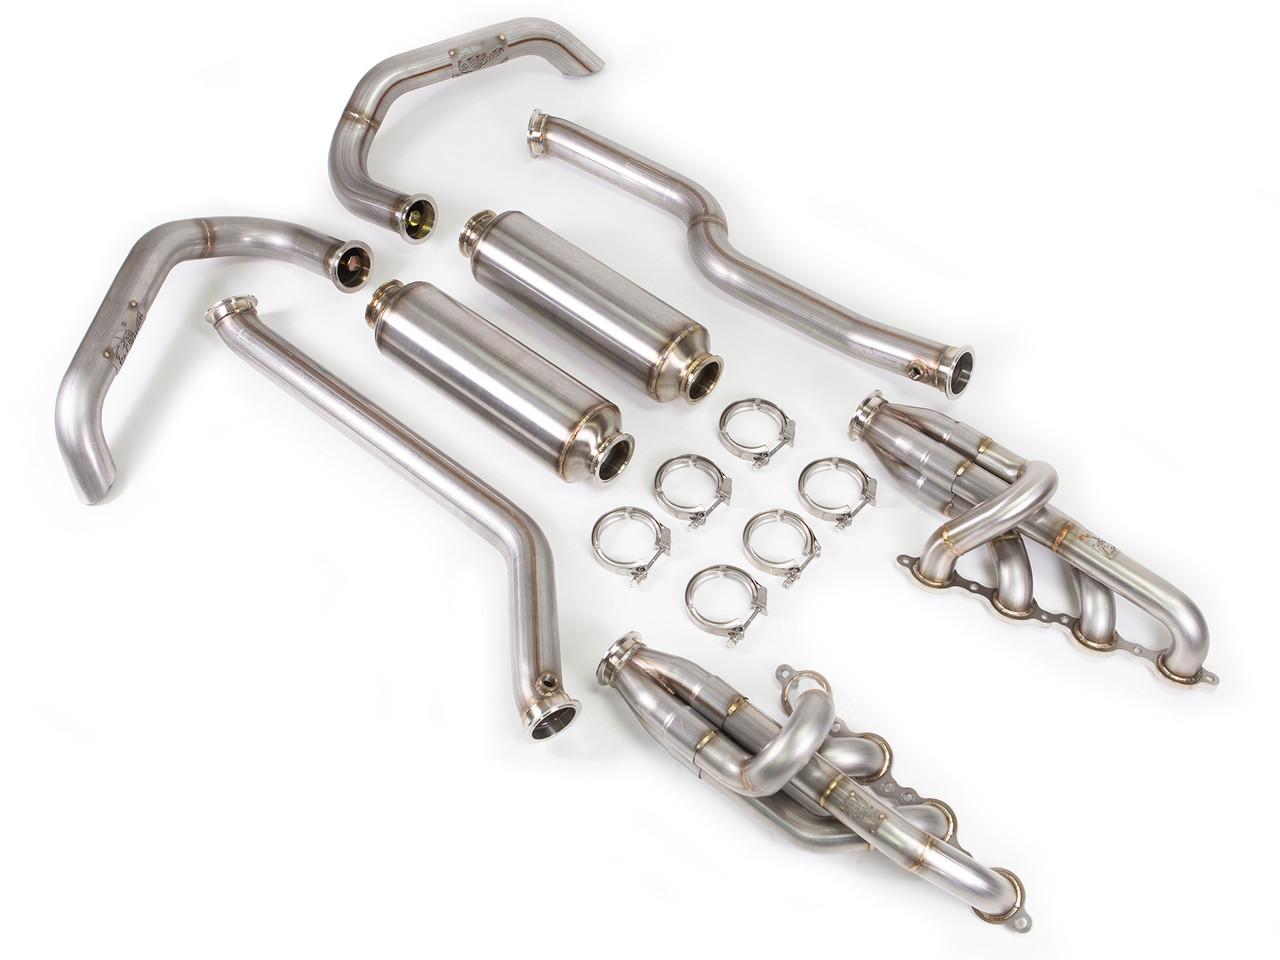 AFE Full Exhaust System (For Tracer LJ Suspension)